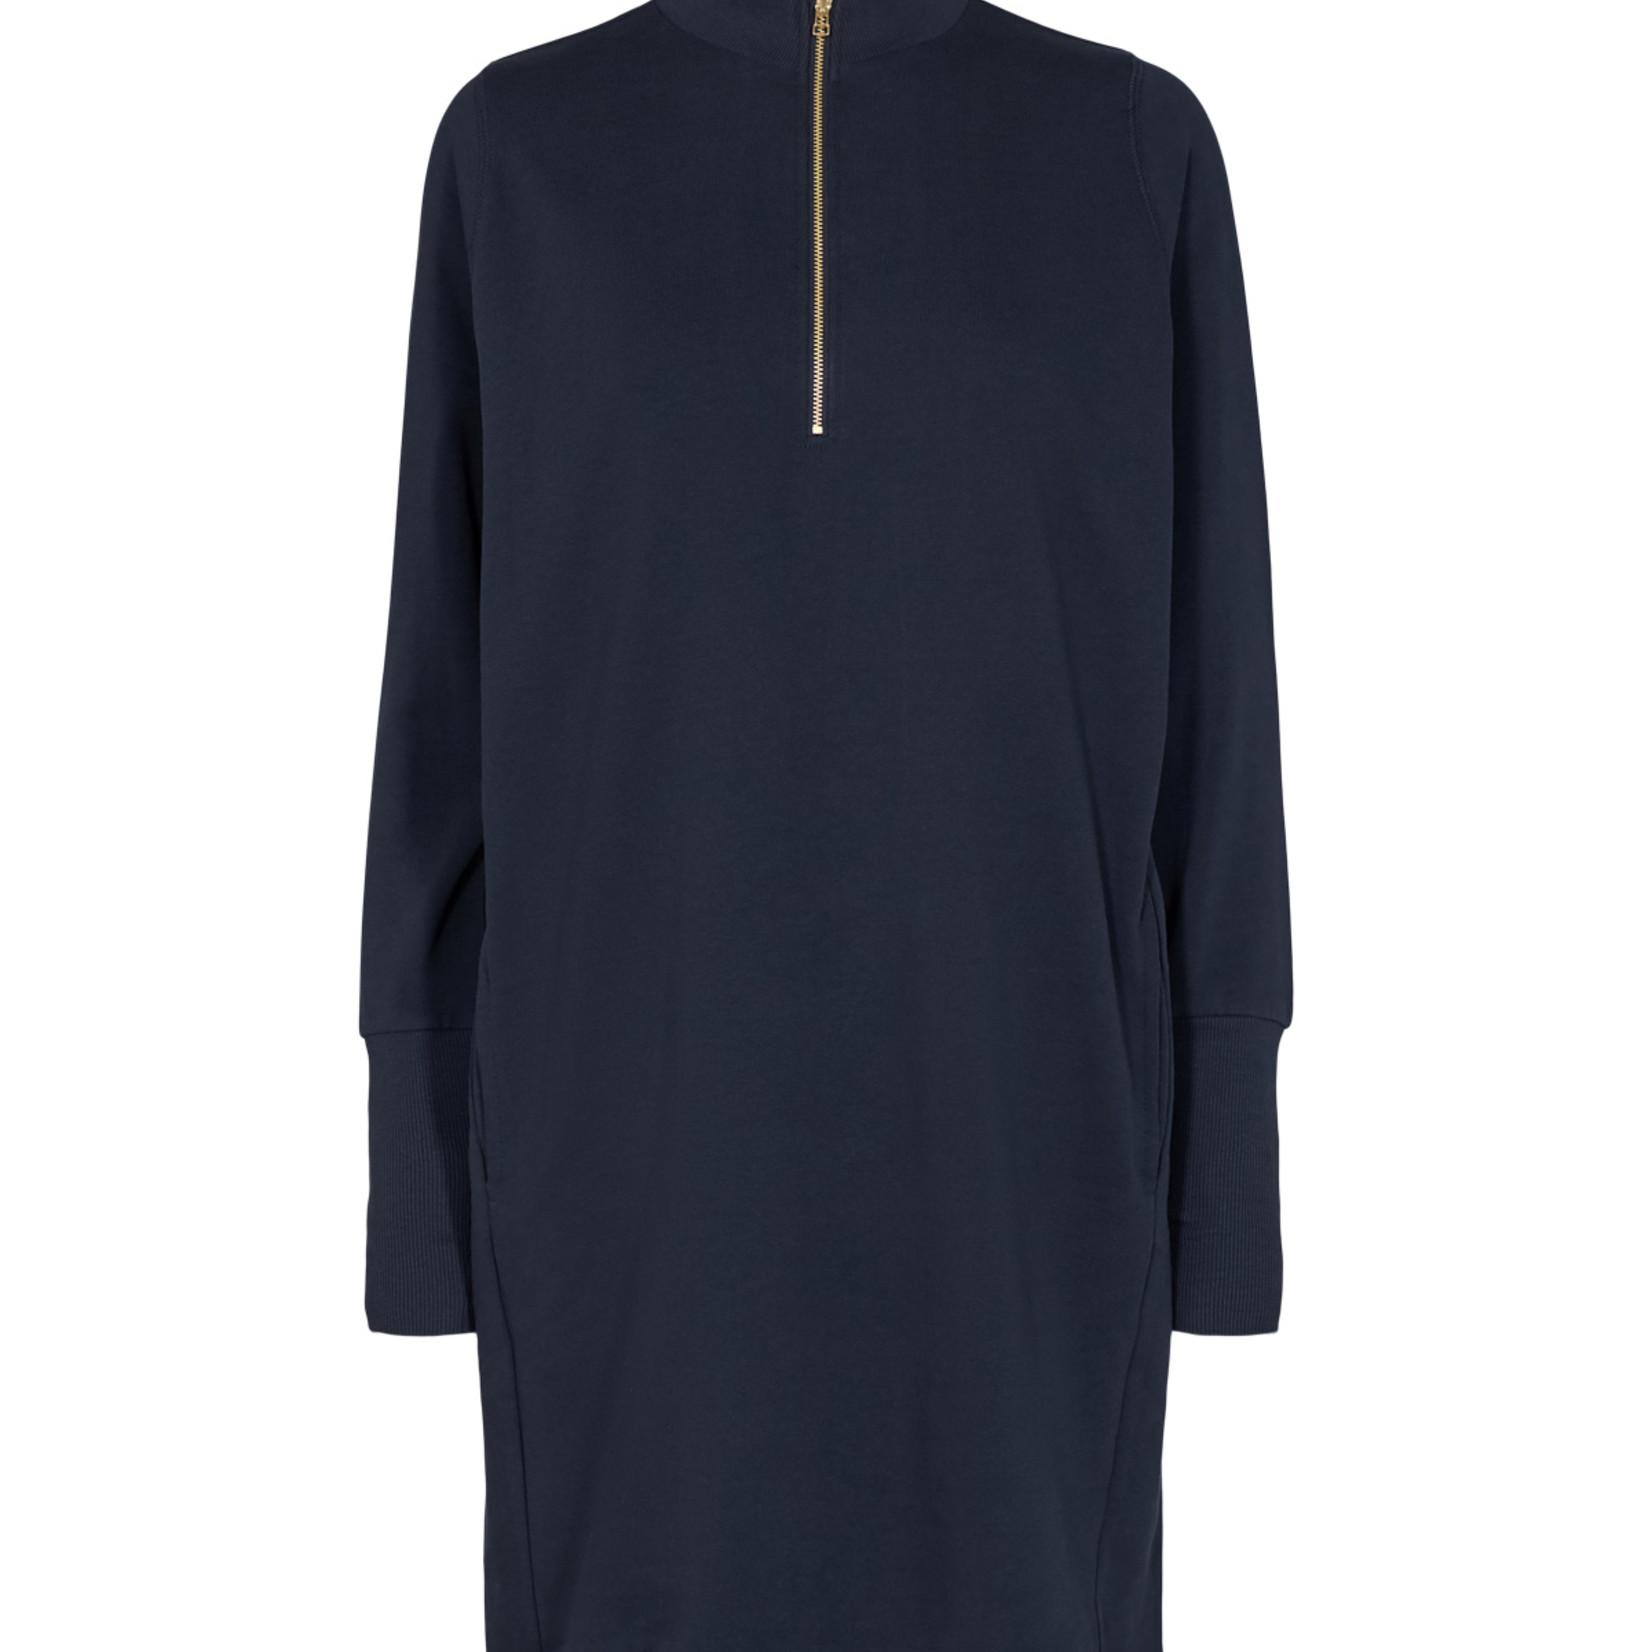 NÜMPH NUNIKOLA DRESS, sweat jurk